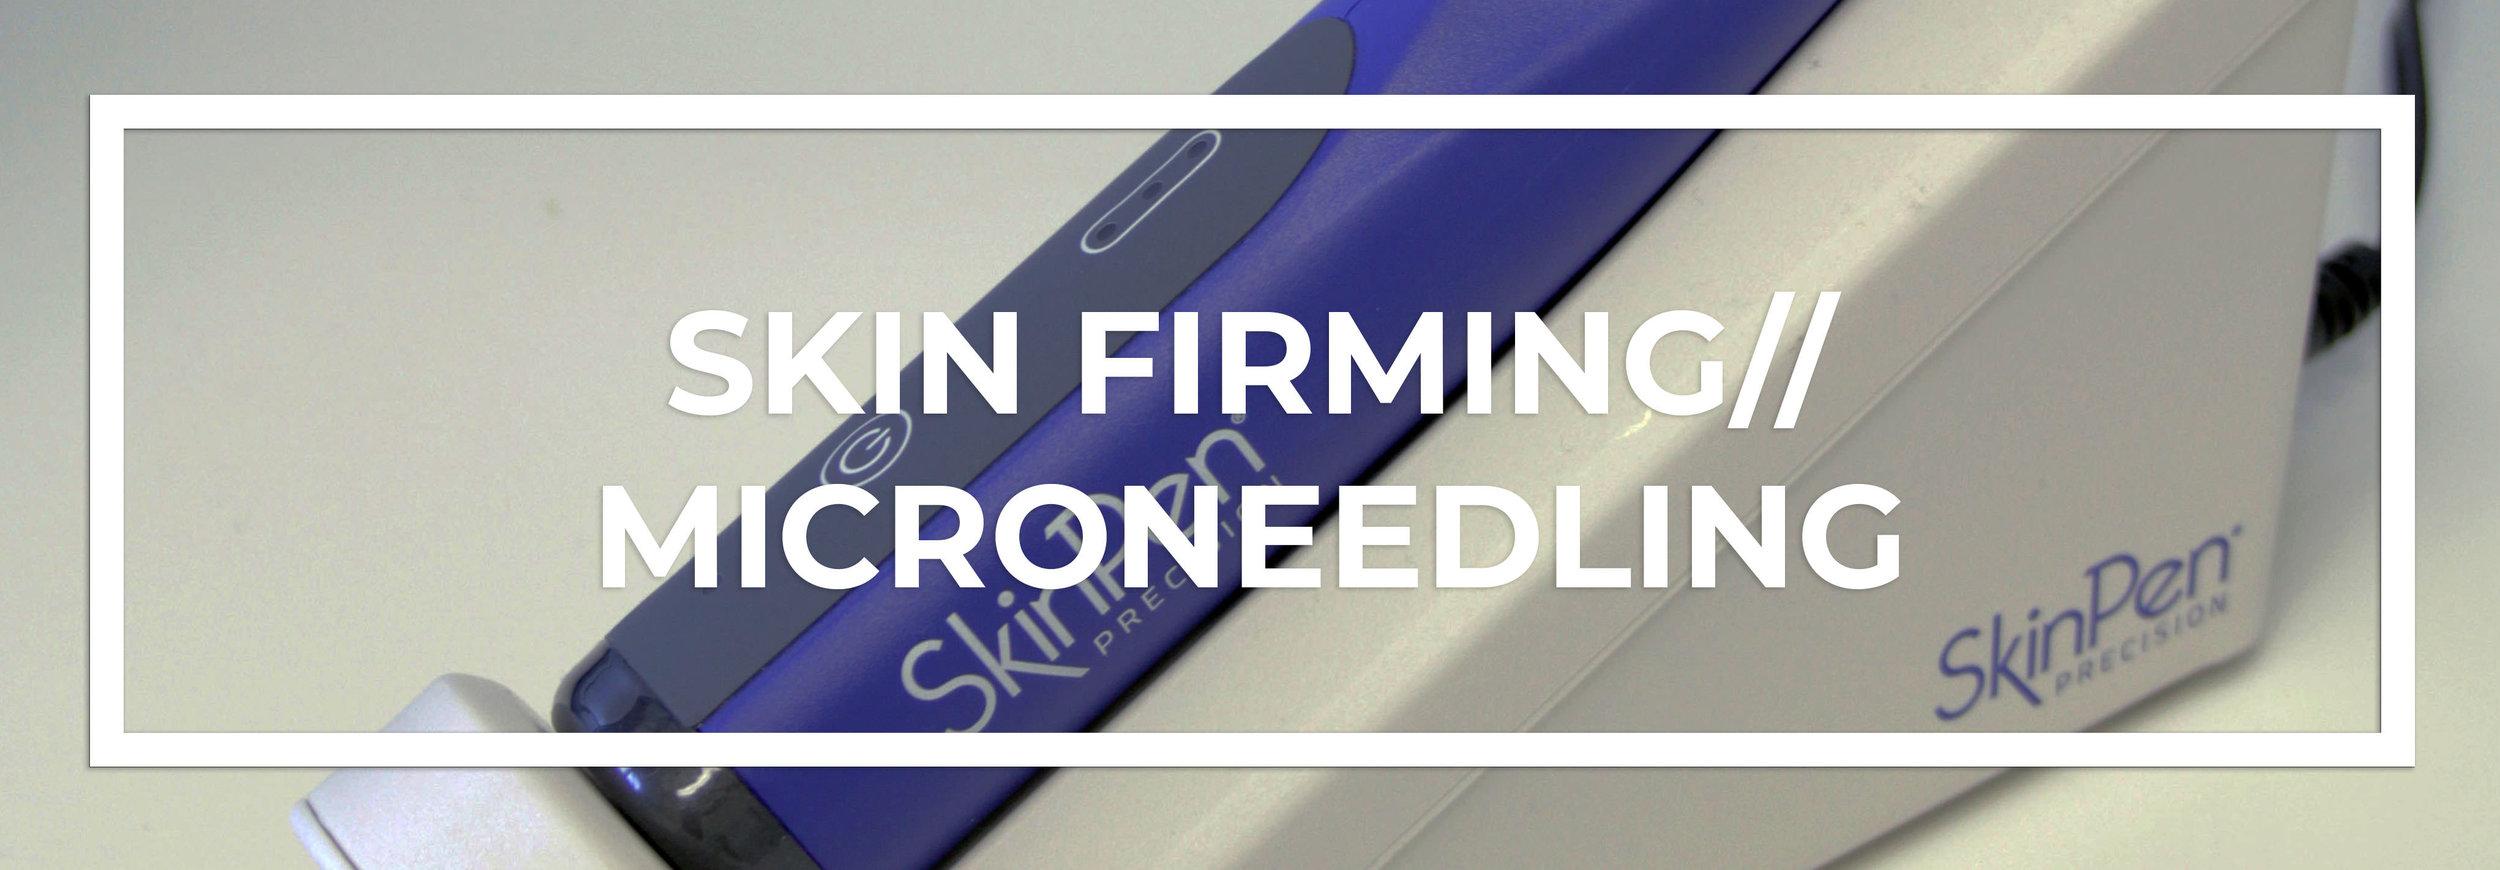 Skin Firming: Viora and Skinpen